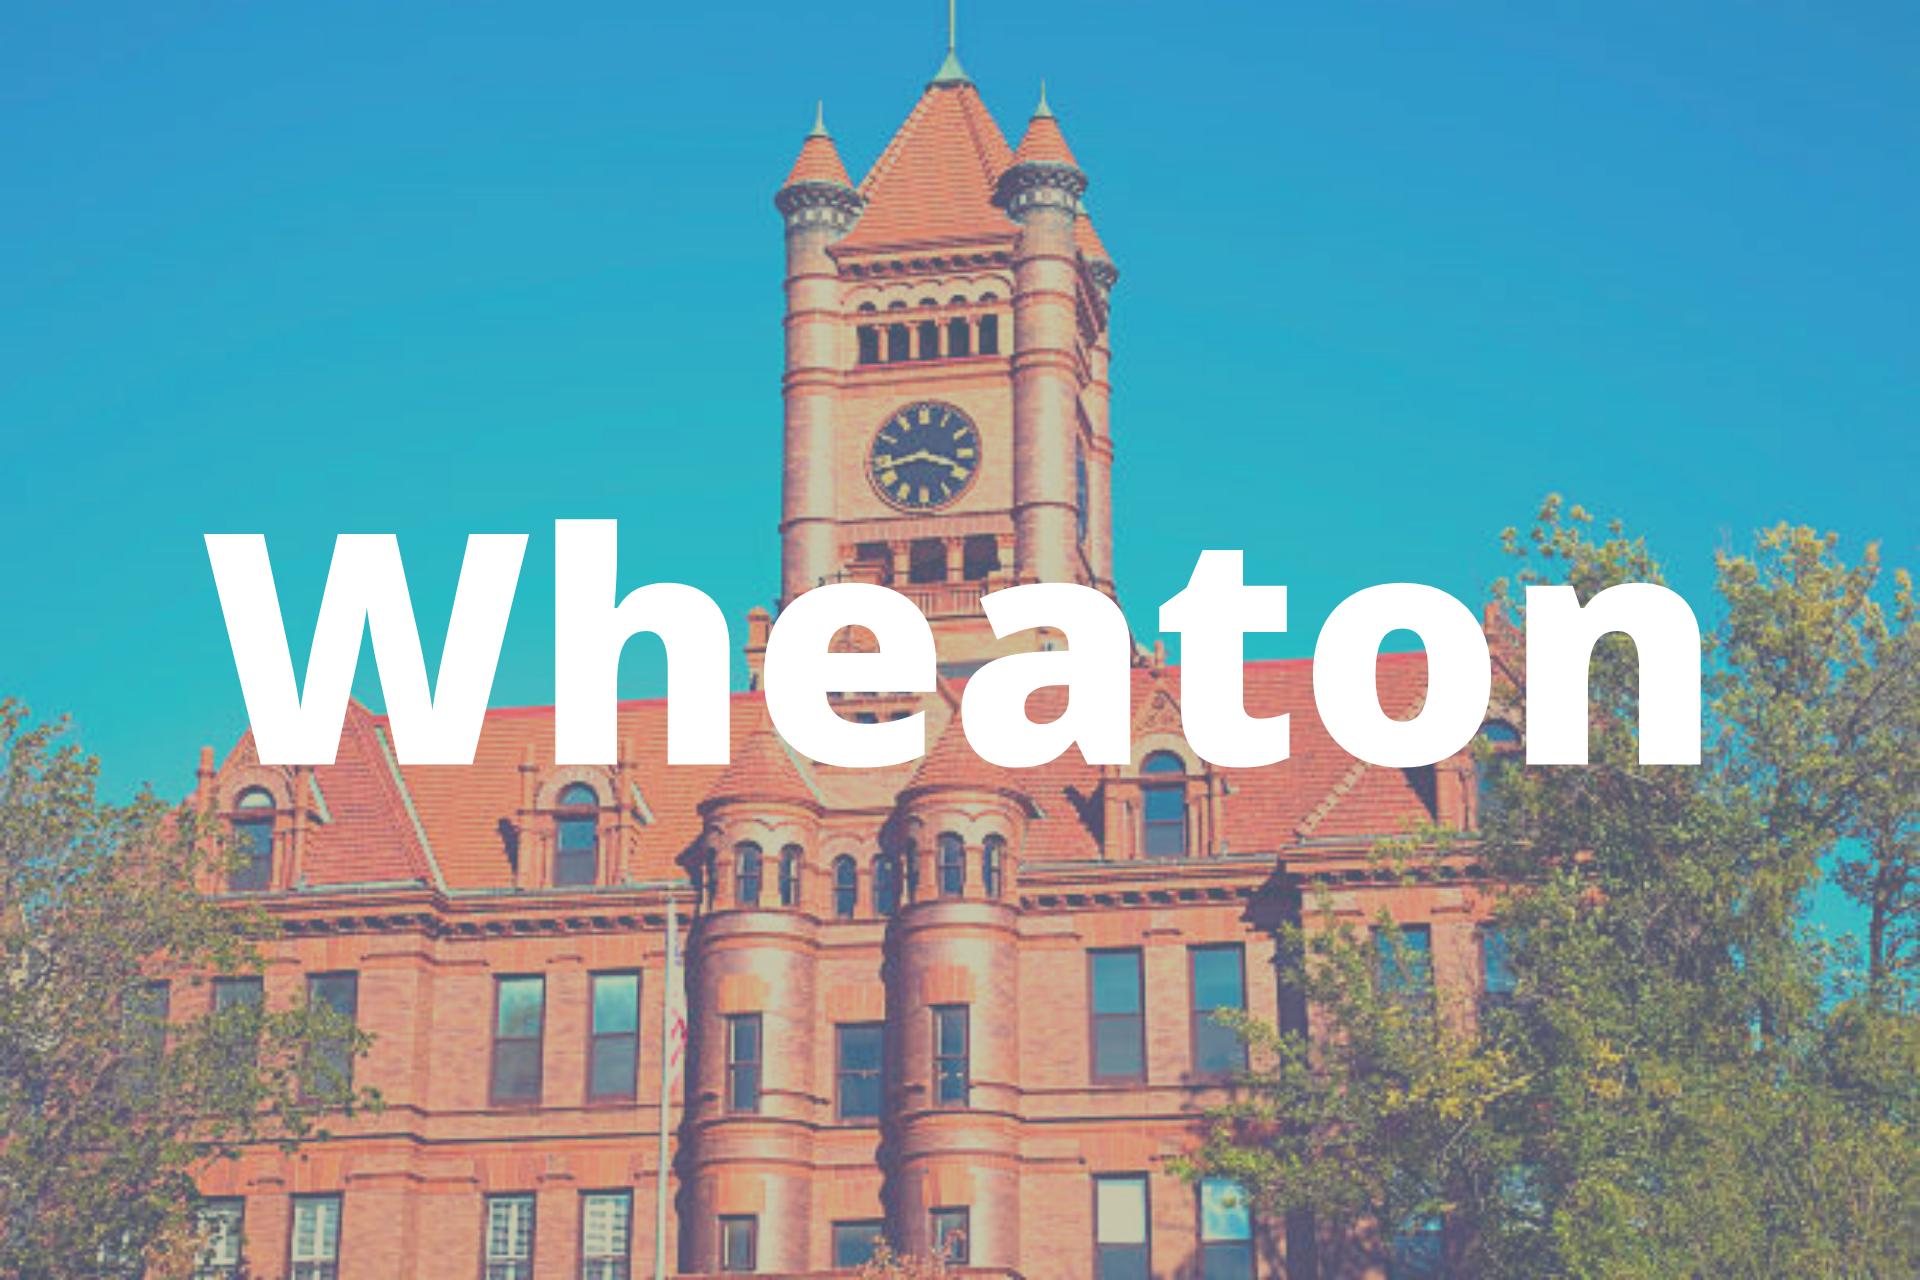 Wheaton Card